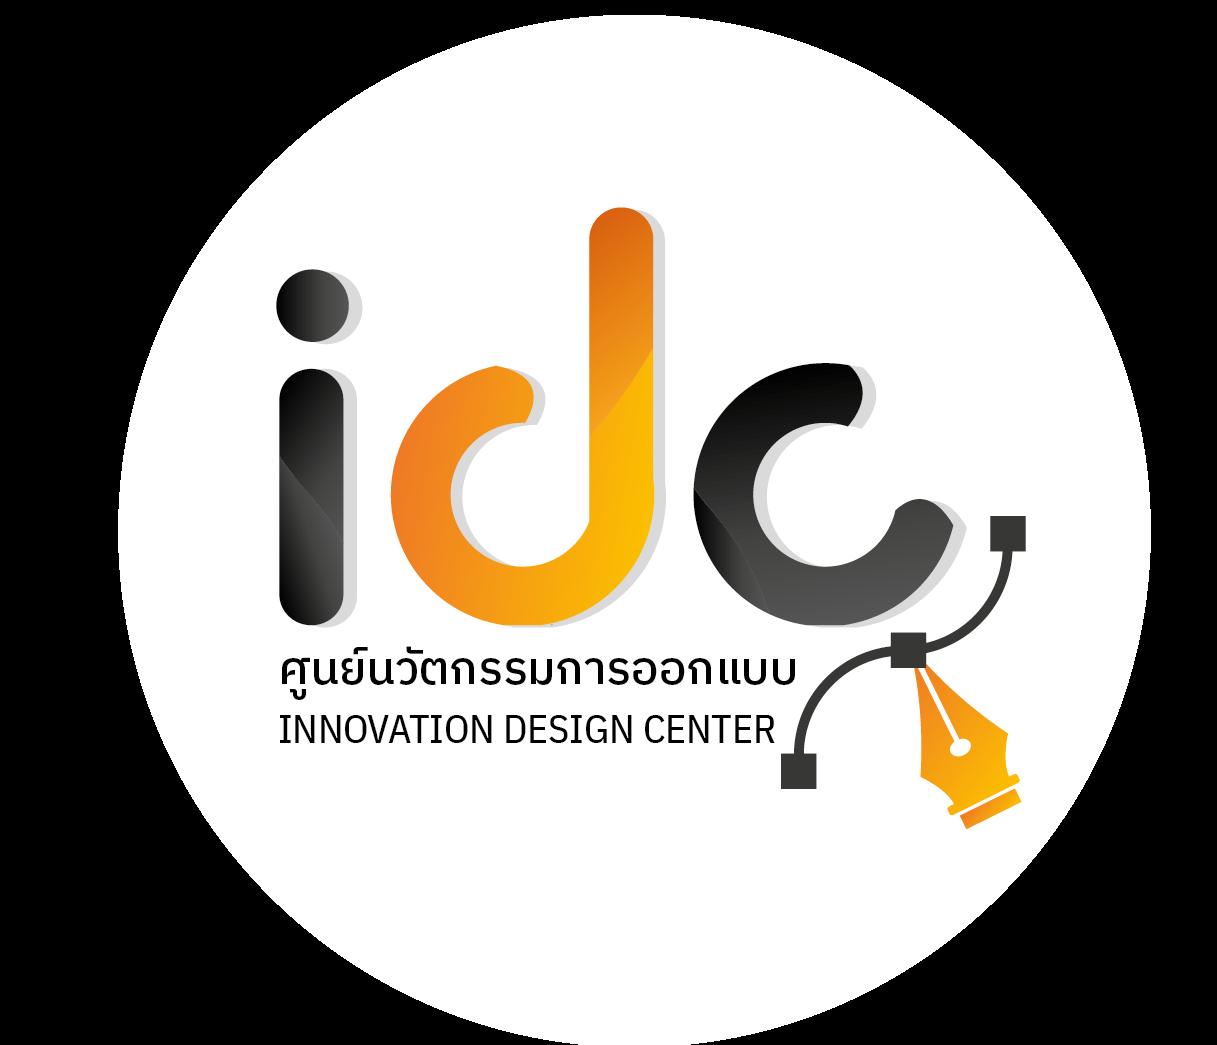 Innovation Design Center, IDC